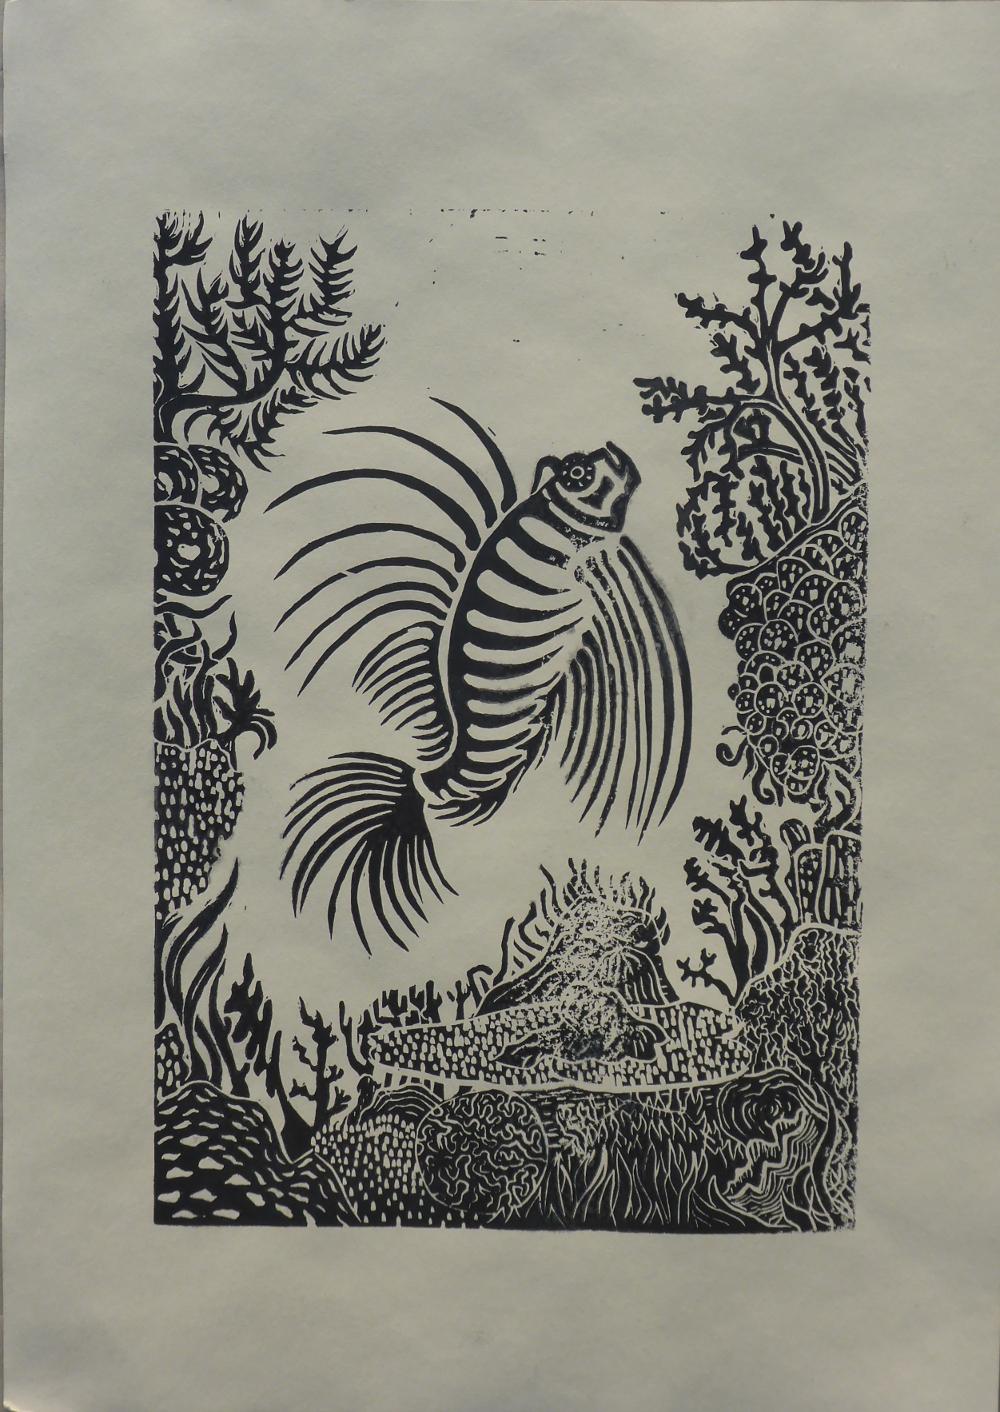 """Das Riff I"", 2019, Linolschnitt auf Papier, 30 x 42 cm"